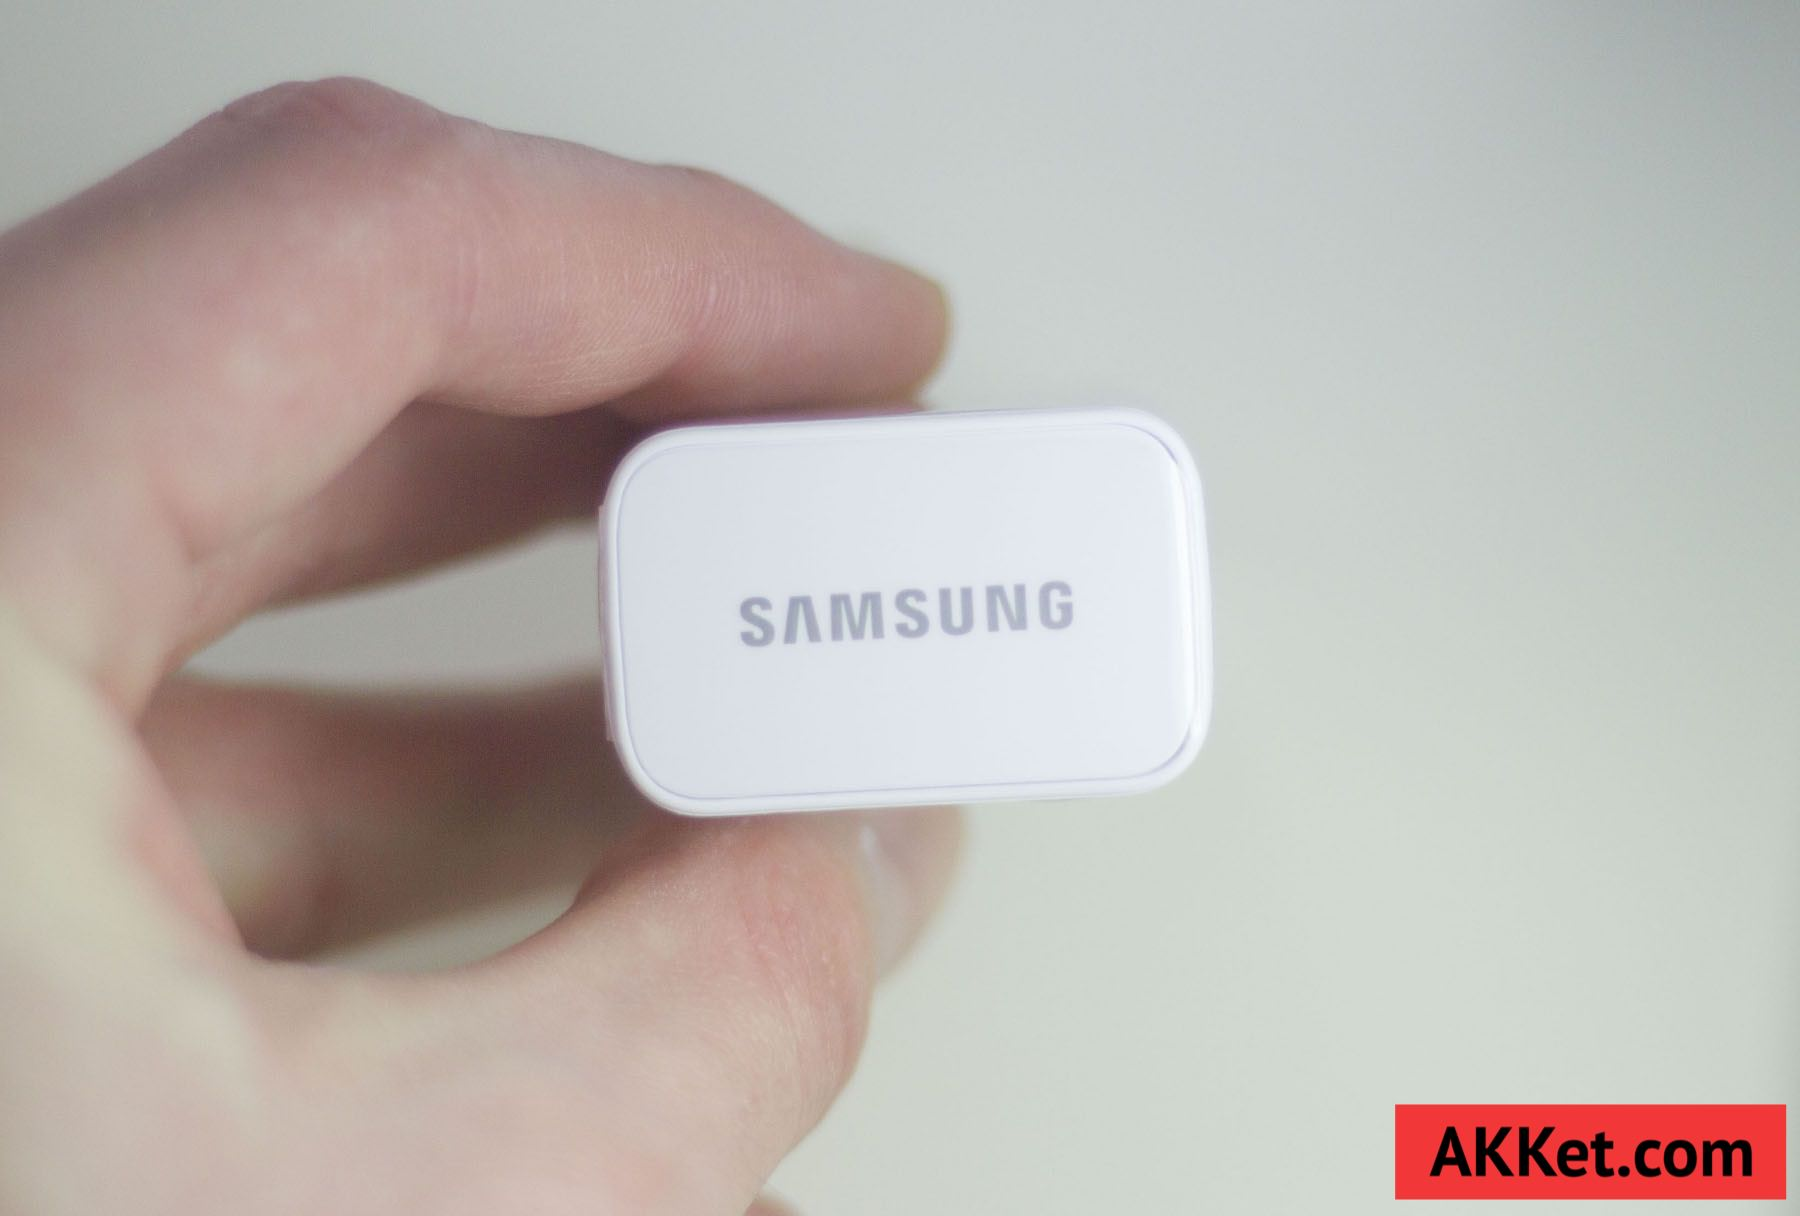 Samsung EP-TA20 Adaptive Fast Charging Galaxy Note 5 S6 11